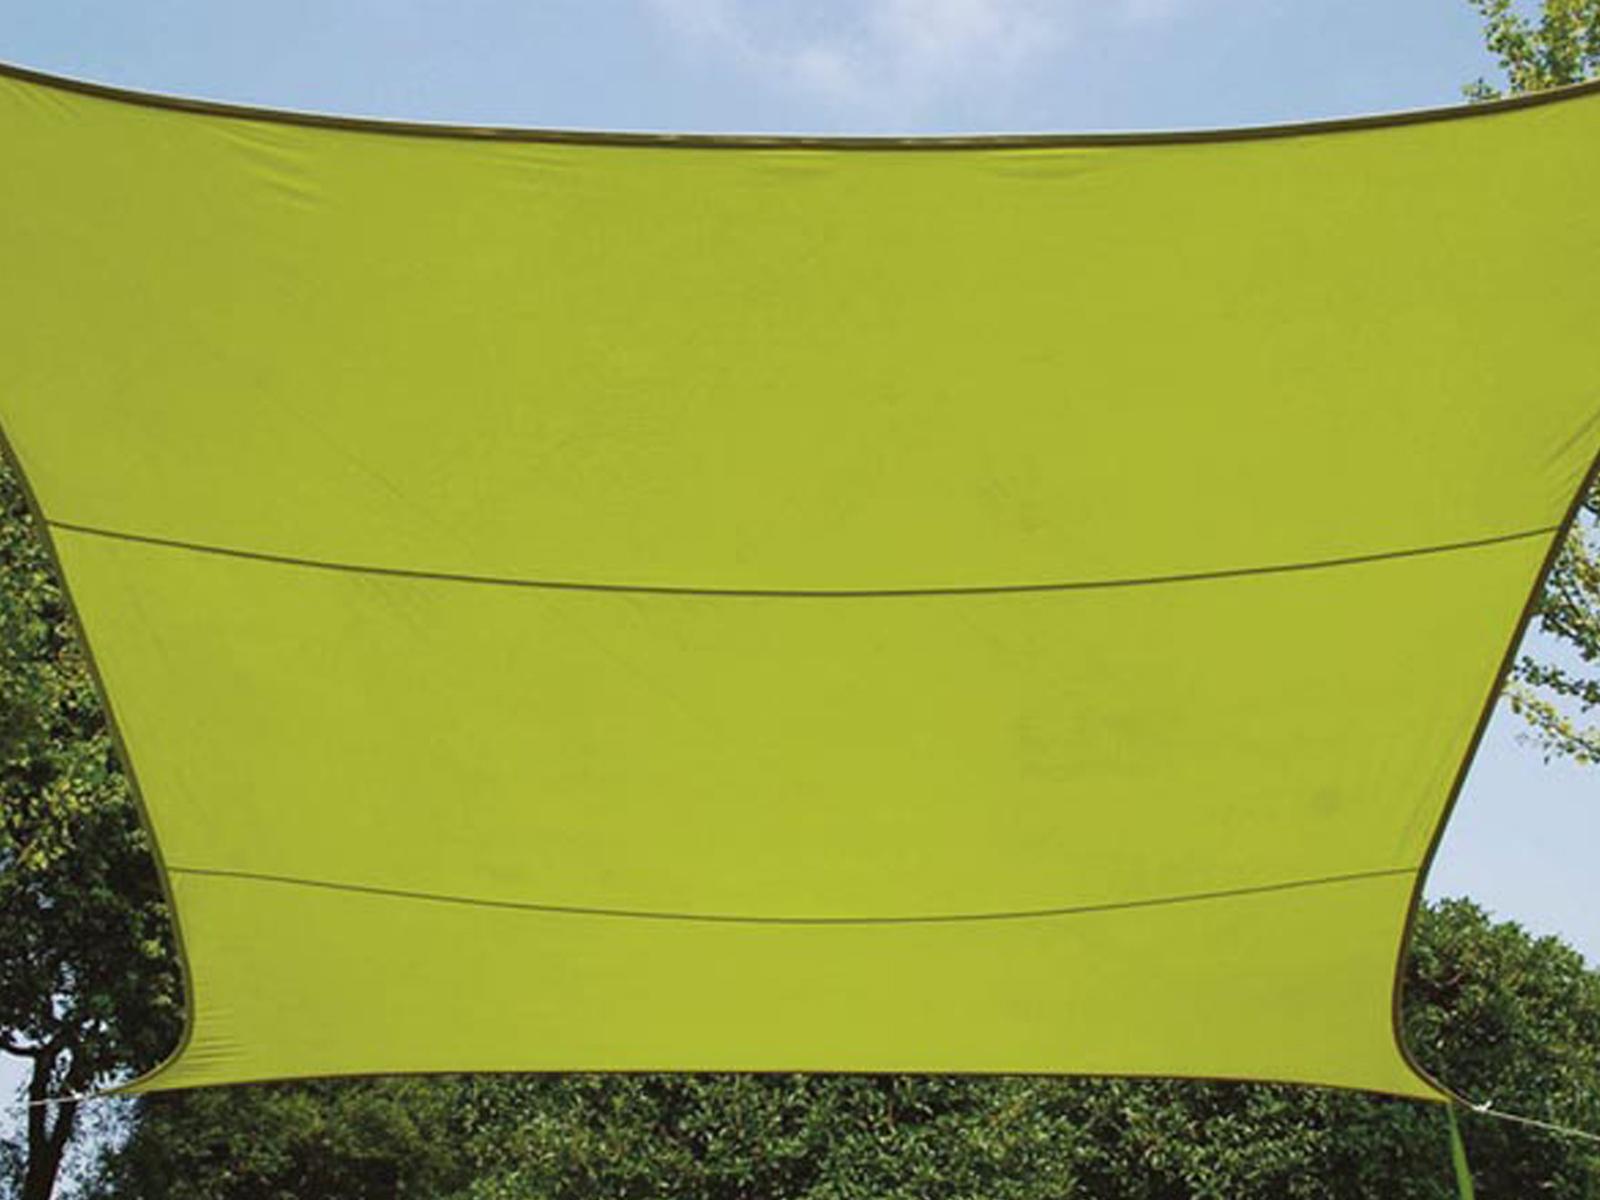 Sonnensegel Regenschutz PEREL, Lime Grün, 500 x 500 cm… |